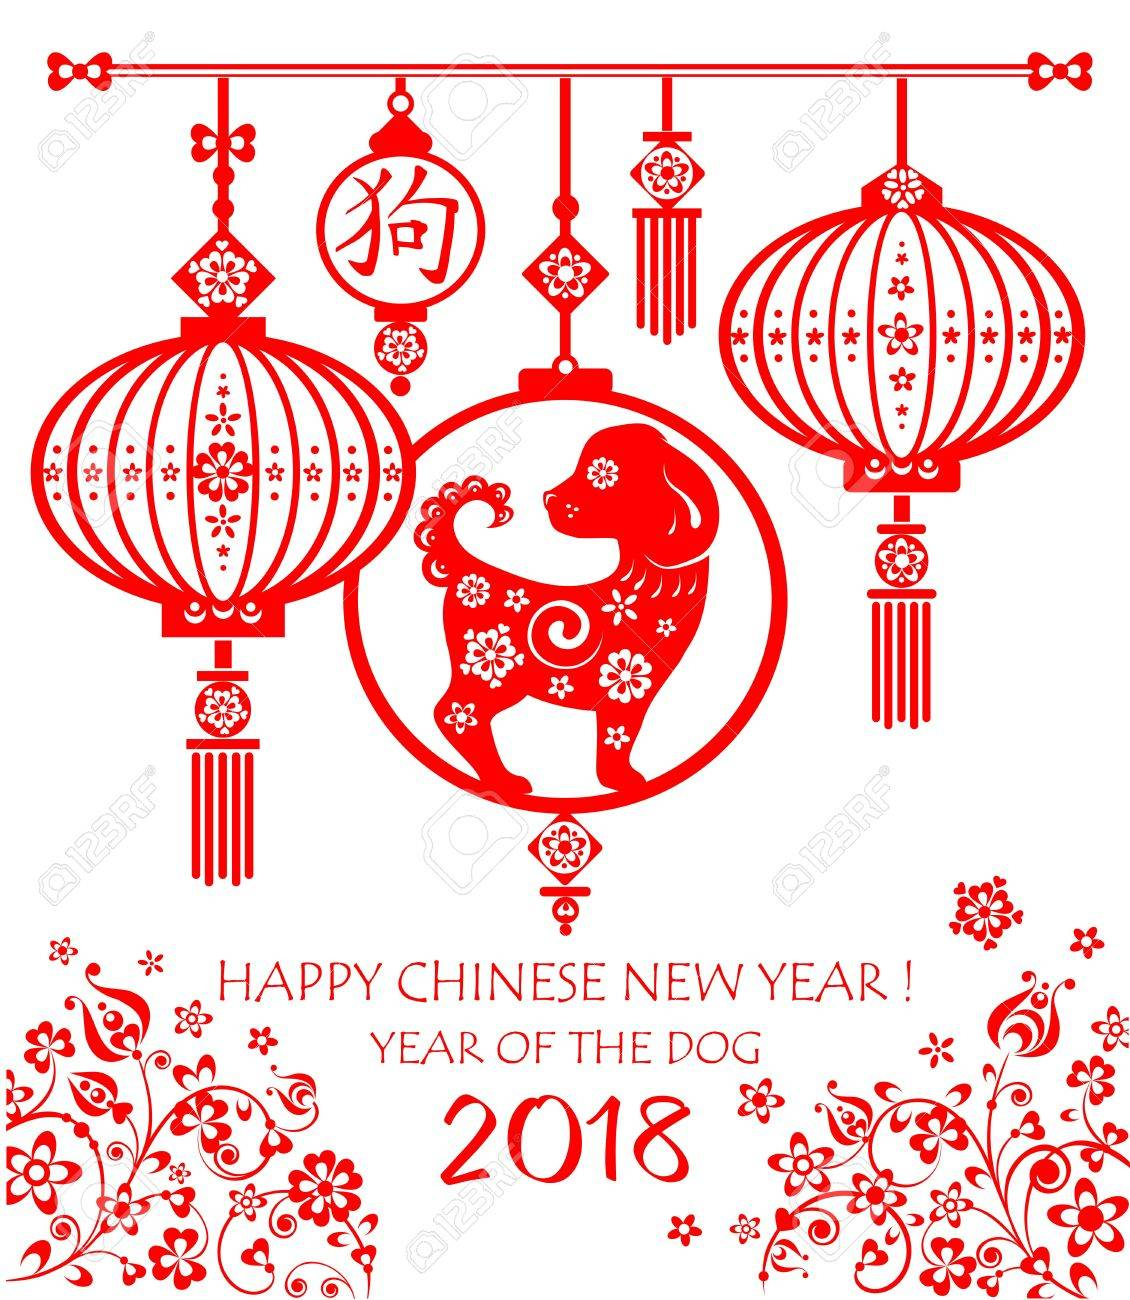 image drole nouvel an chinois